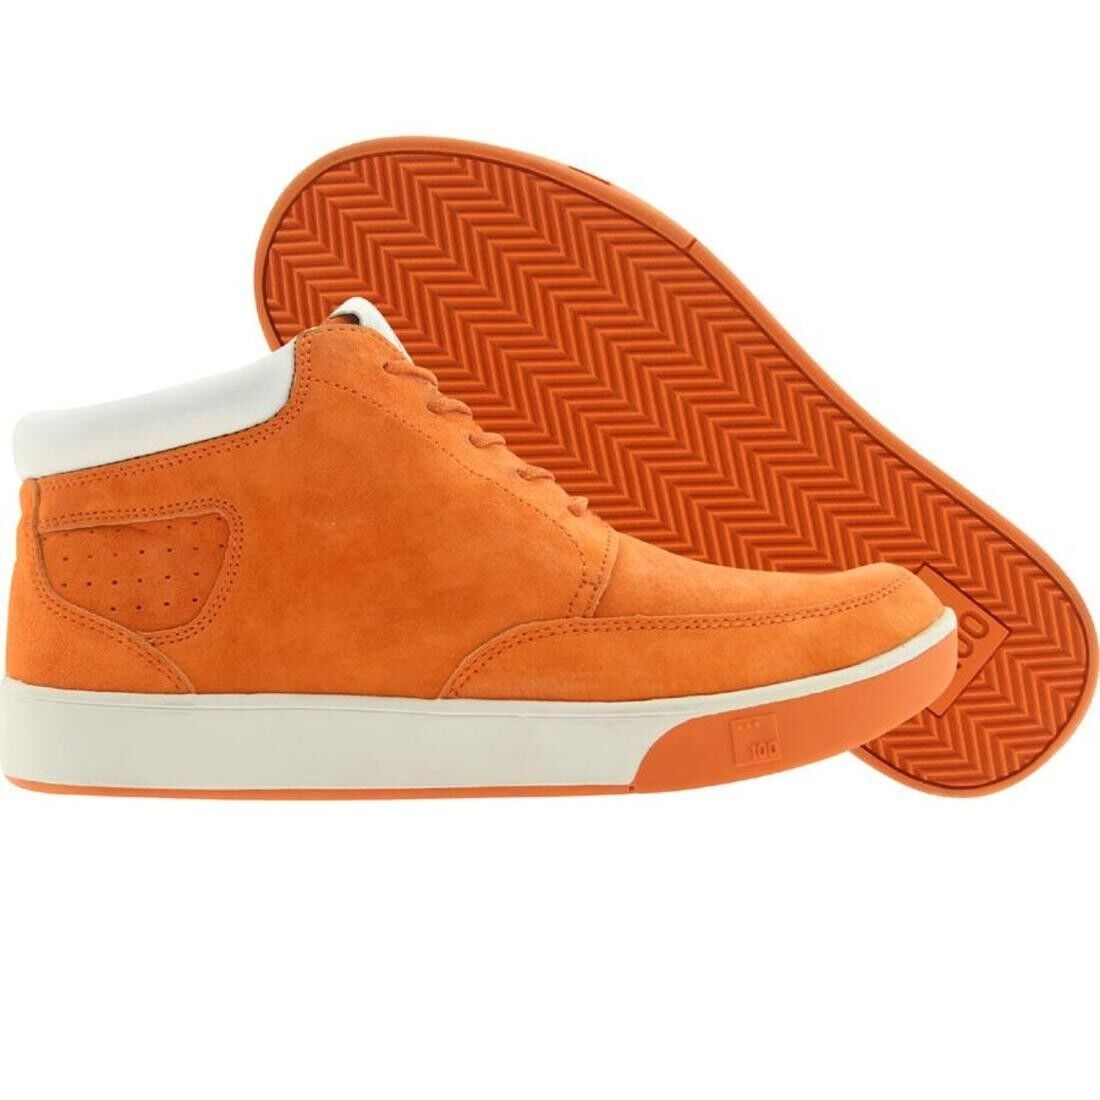 .99 100 Styles and Running Abbott (melon) ABMEL08 Scarpe classiche da uomo